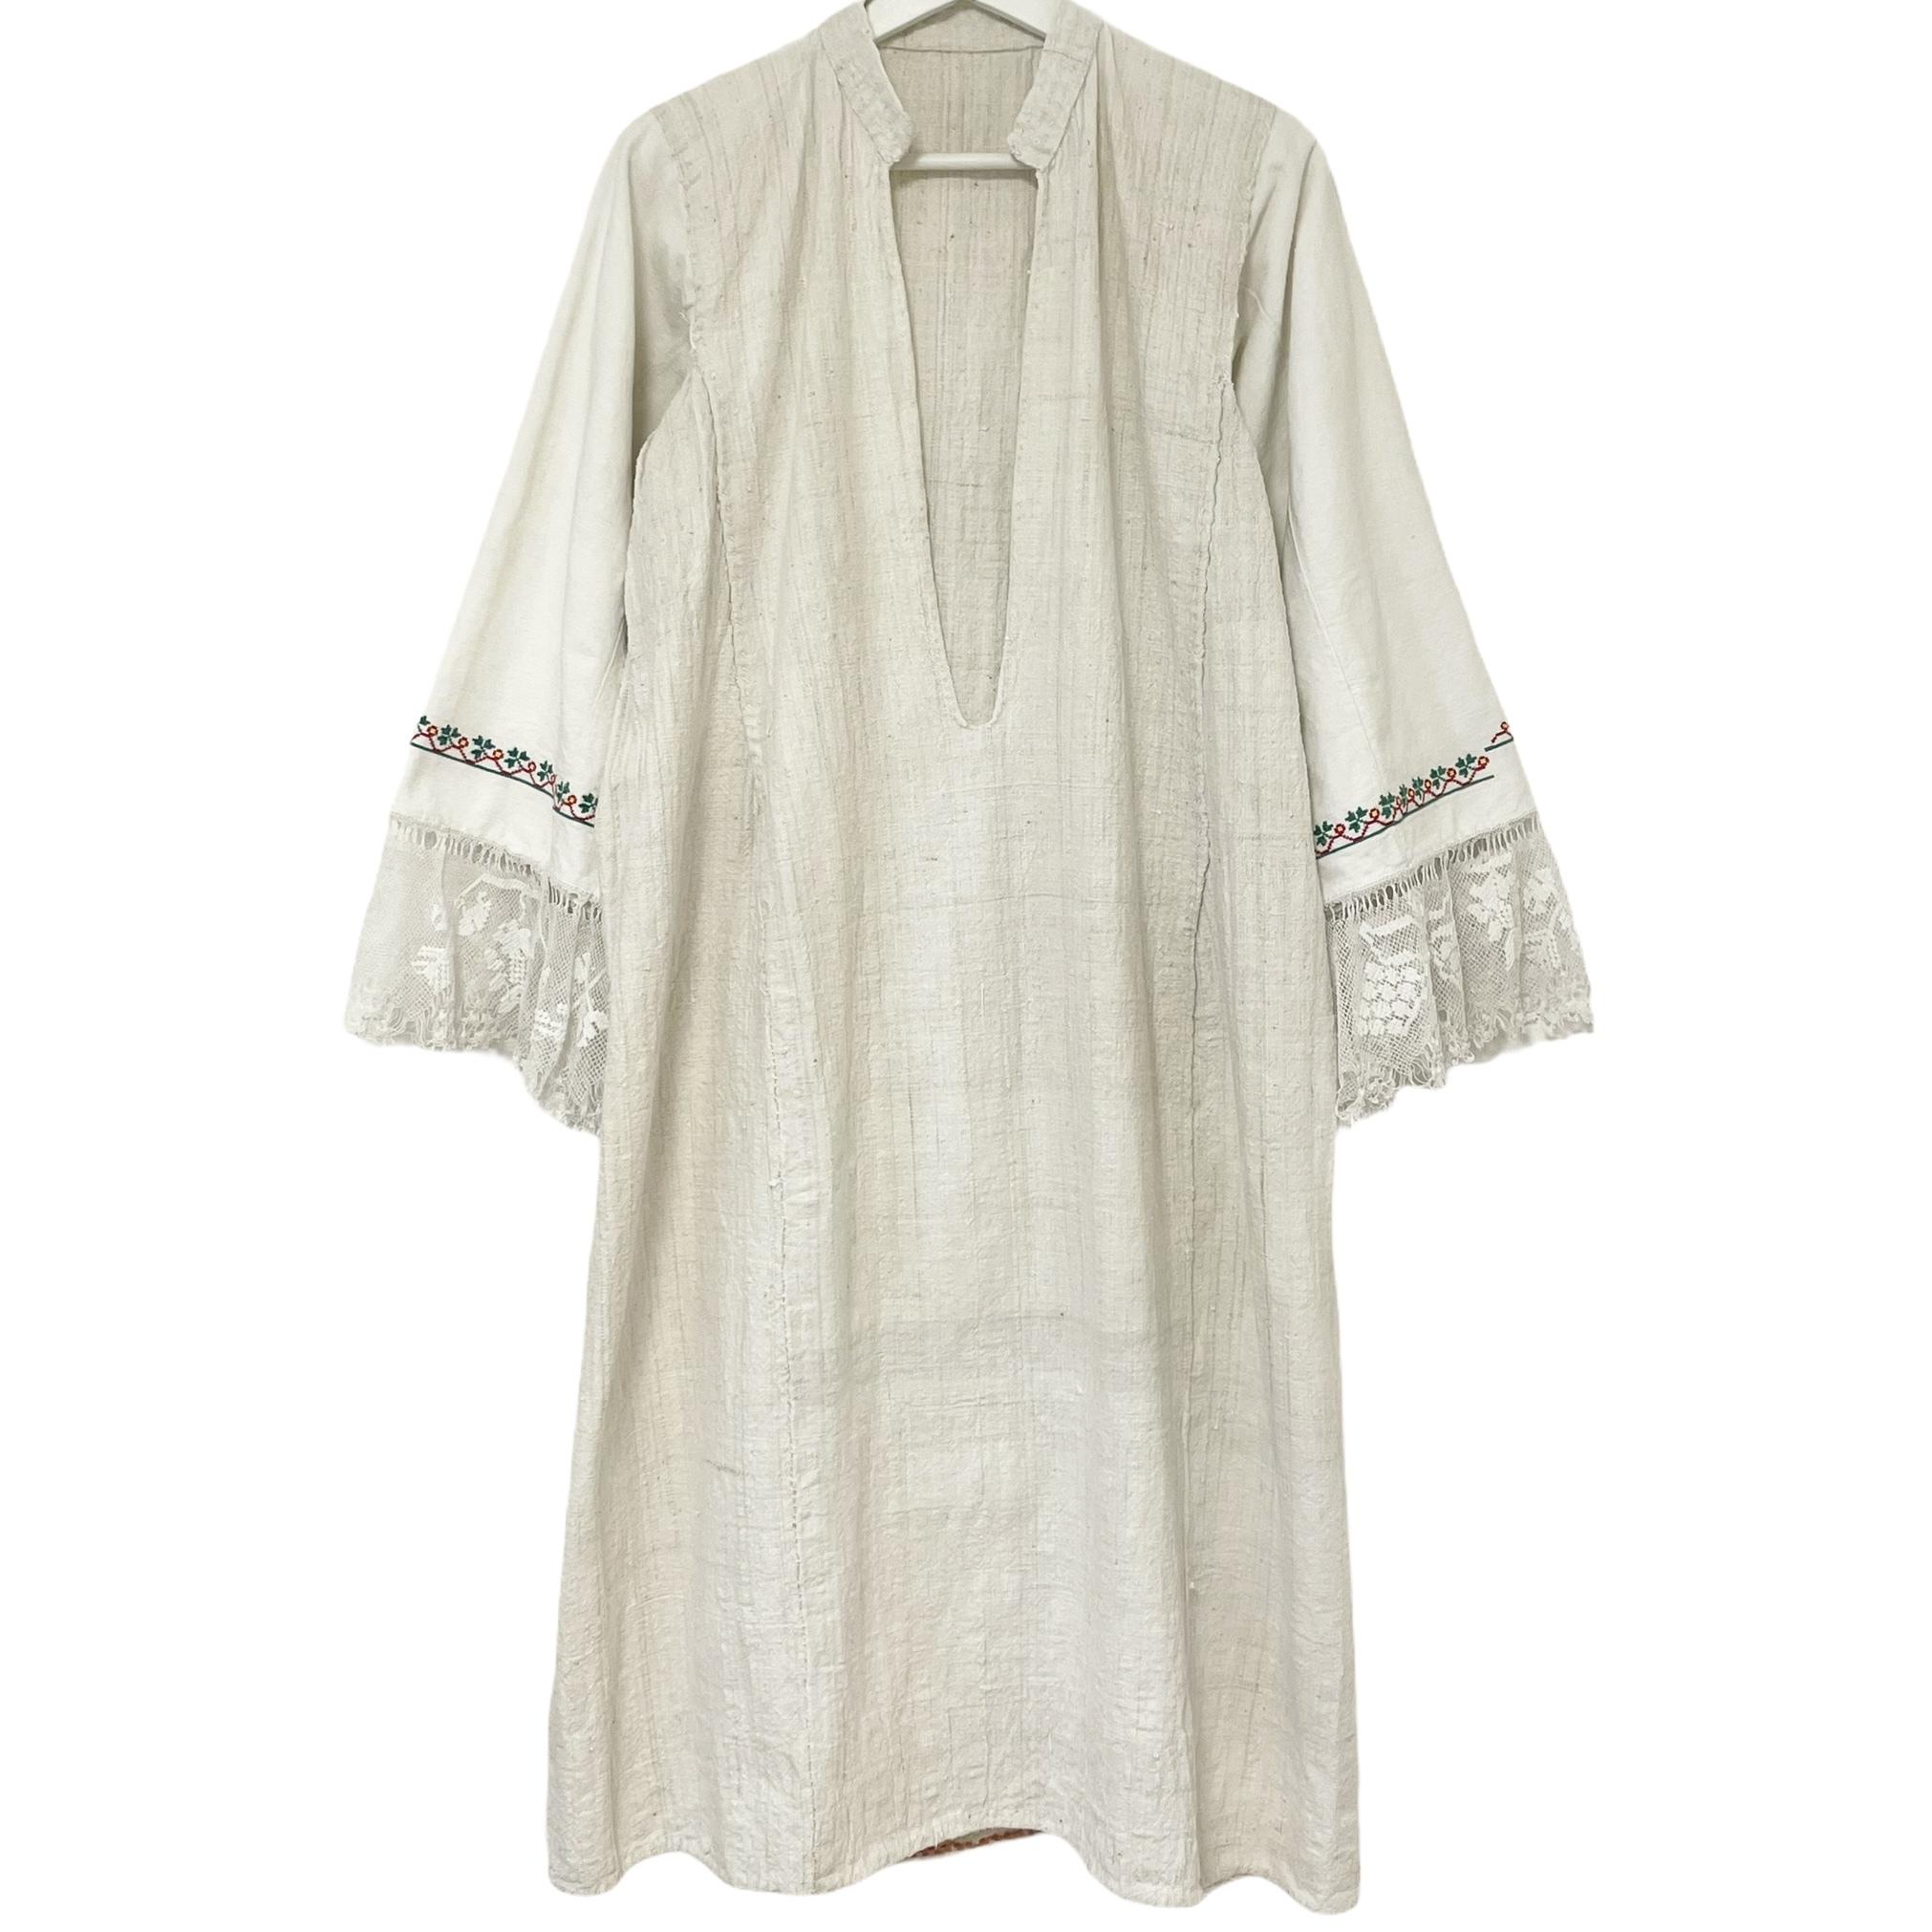 Bulgalian Embroidered Linen Dress